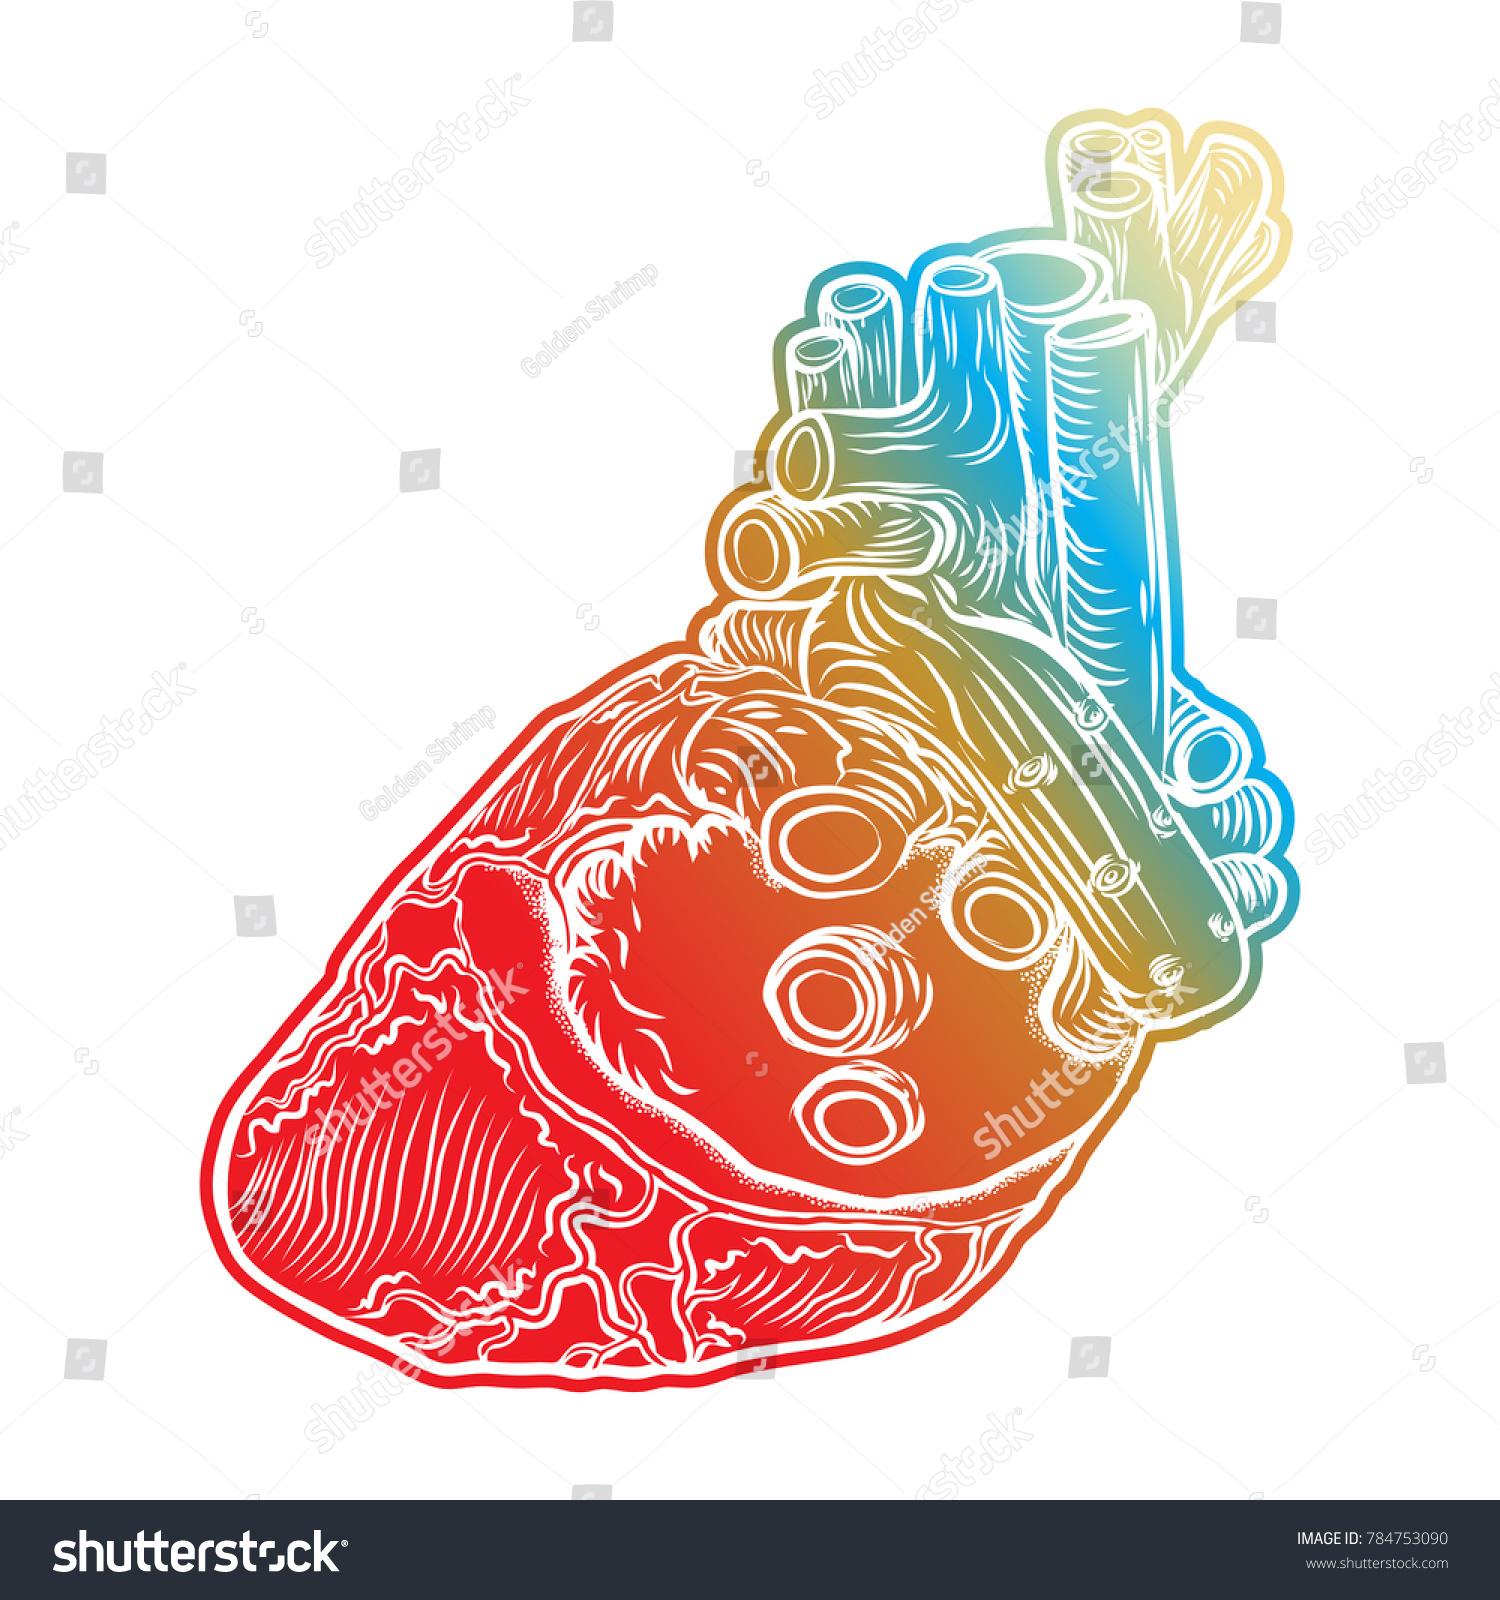 Human Heart Hand Drawn Flesh Tattoo Stock Illustration 784753090 ...